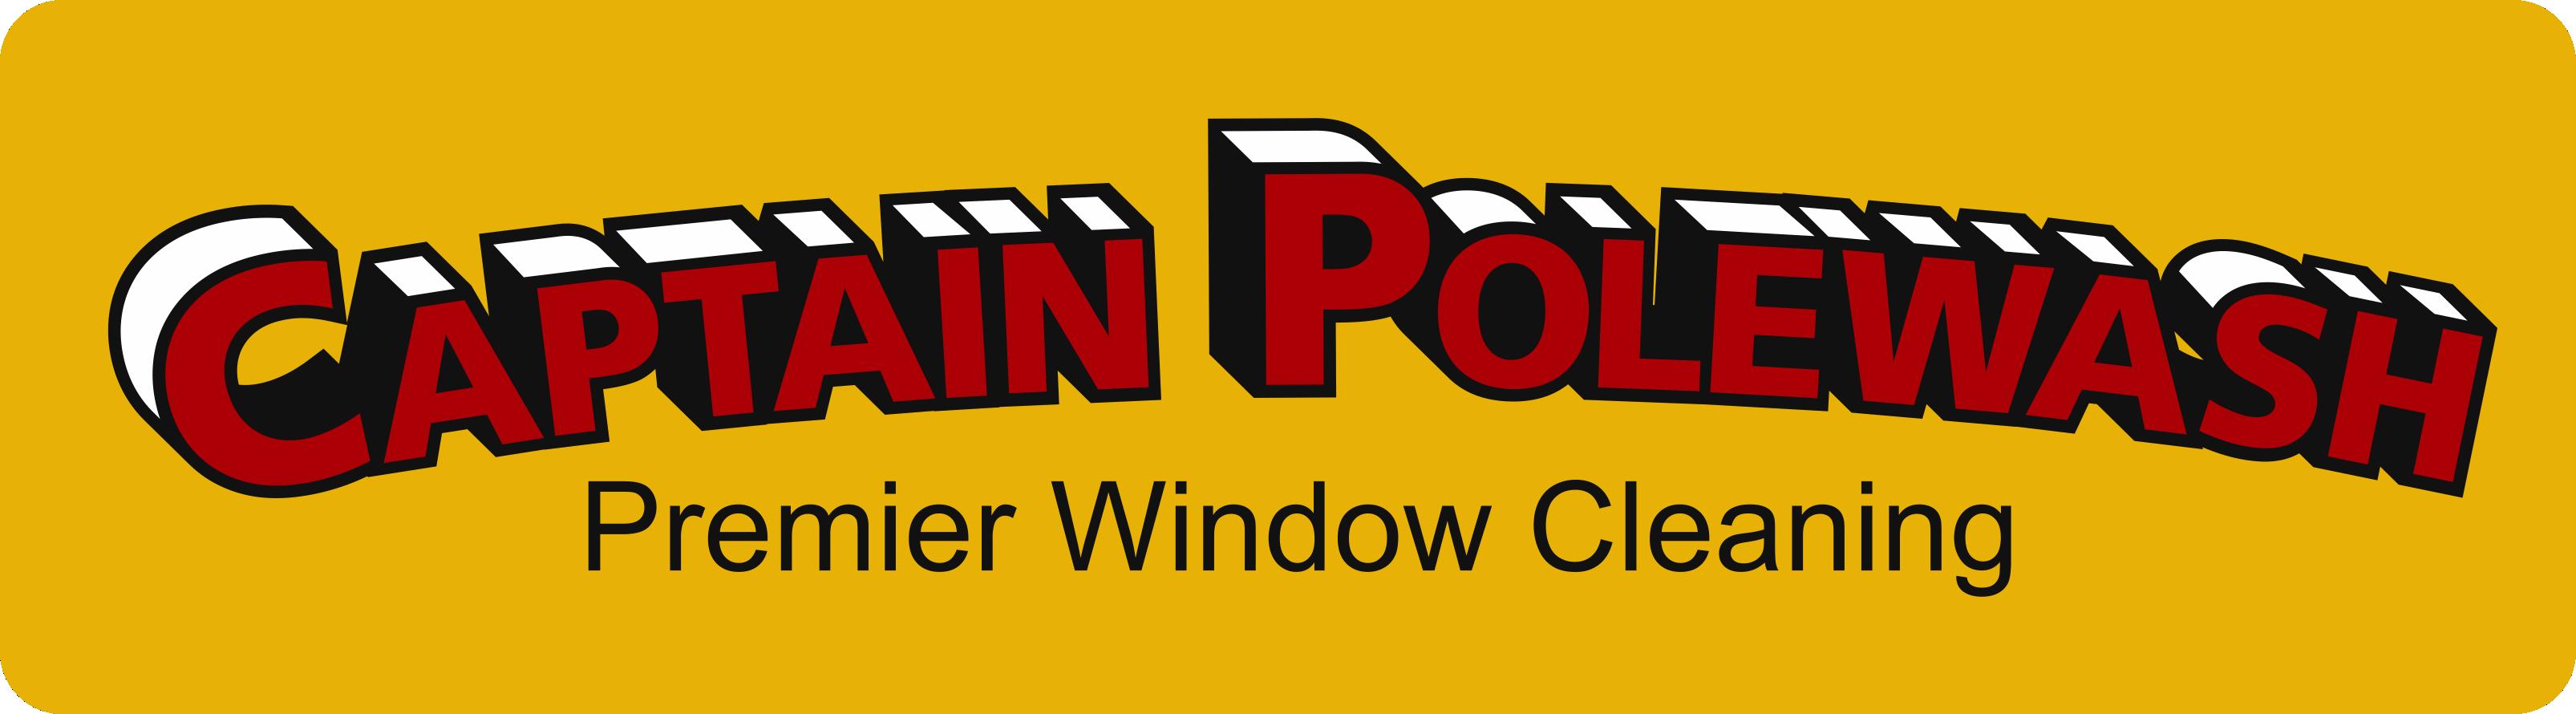 Captain Polewash logo.